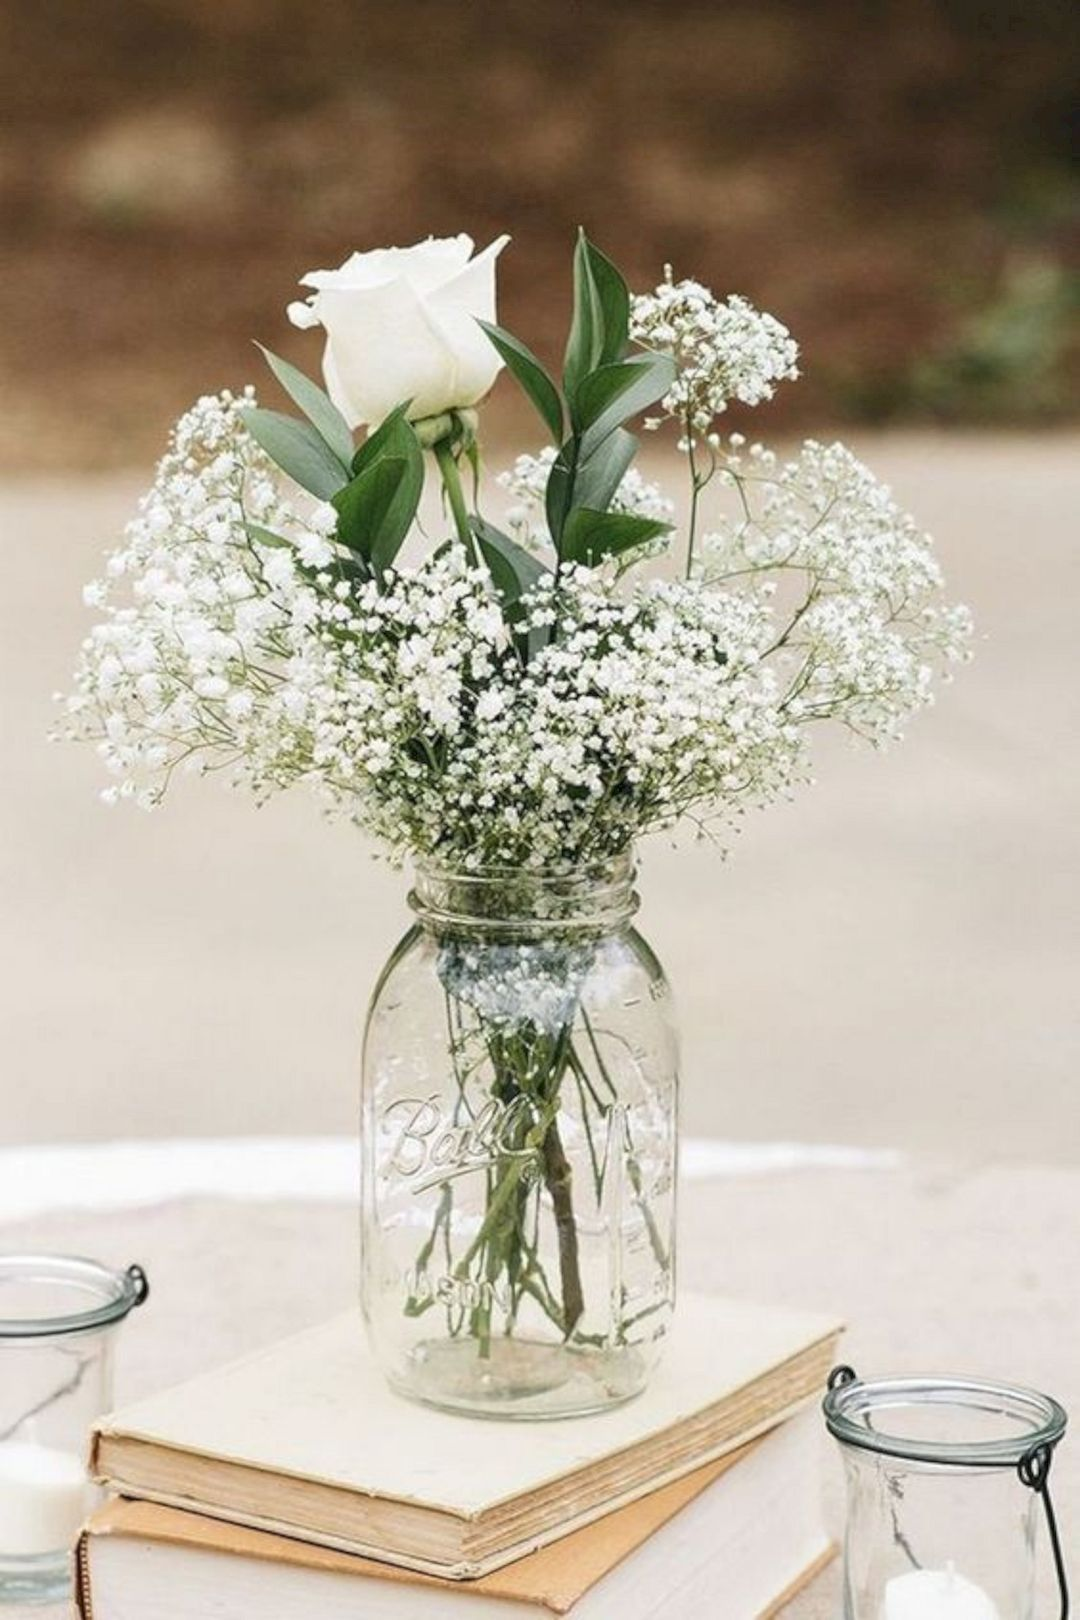 15 wedding ideas on a budget httpsdesignlisticle15 15 wedding ideas on a budget httpsdesignlisticle junglespirit Gallery